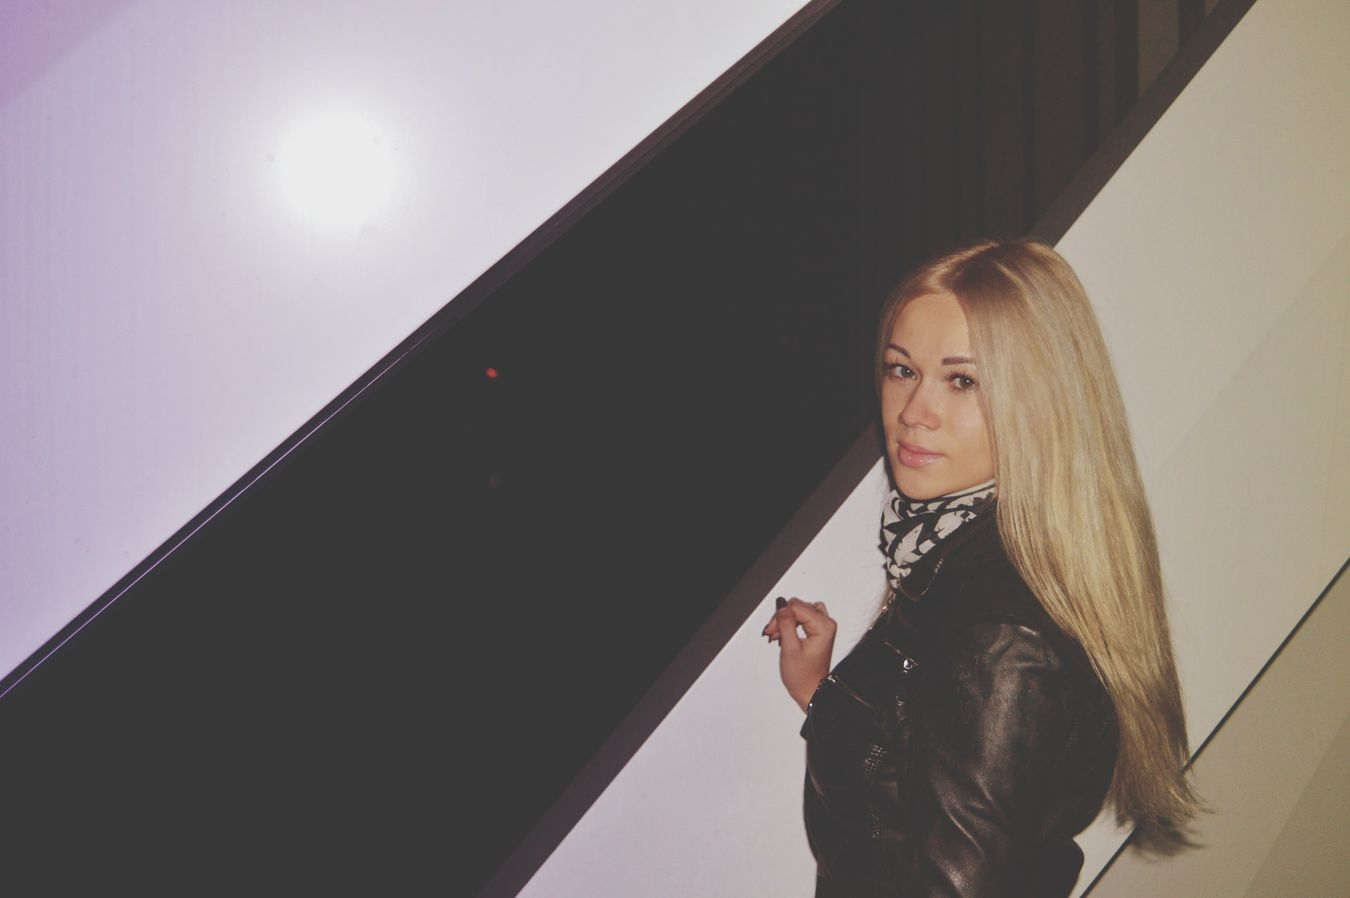 Gorlovka Blondie Beautiful Girl Barbie Girl meine Rapunzel